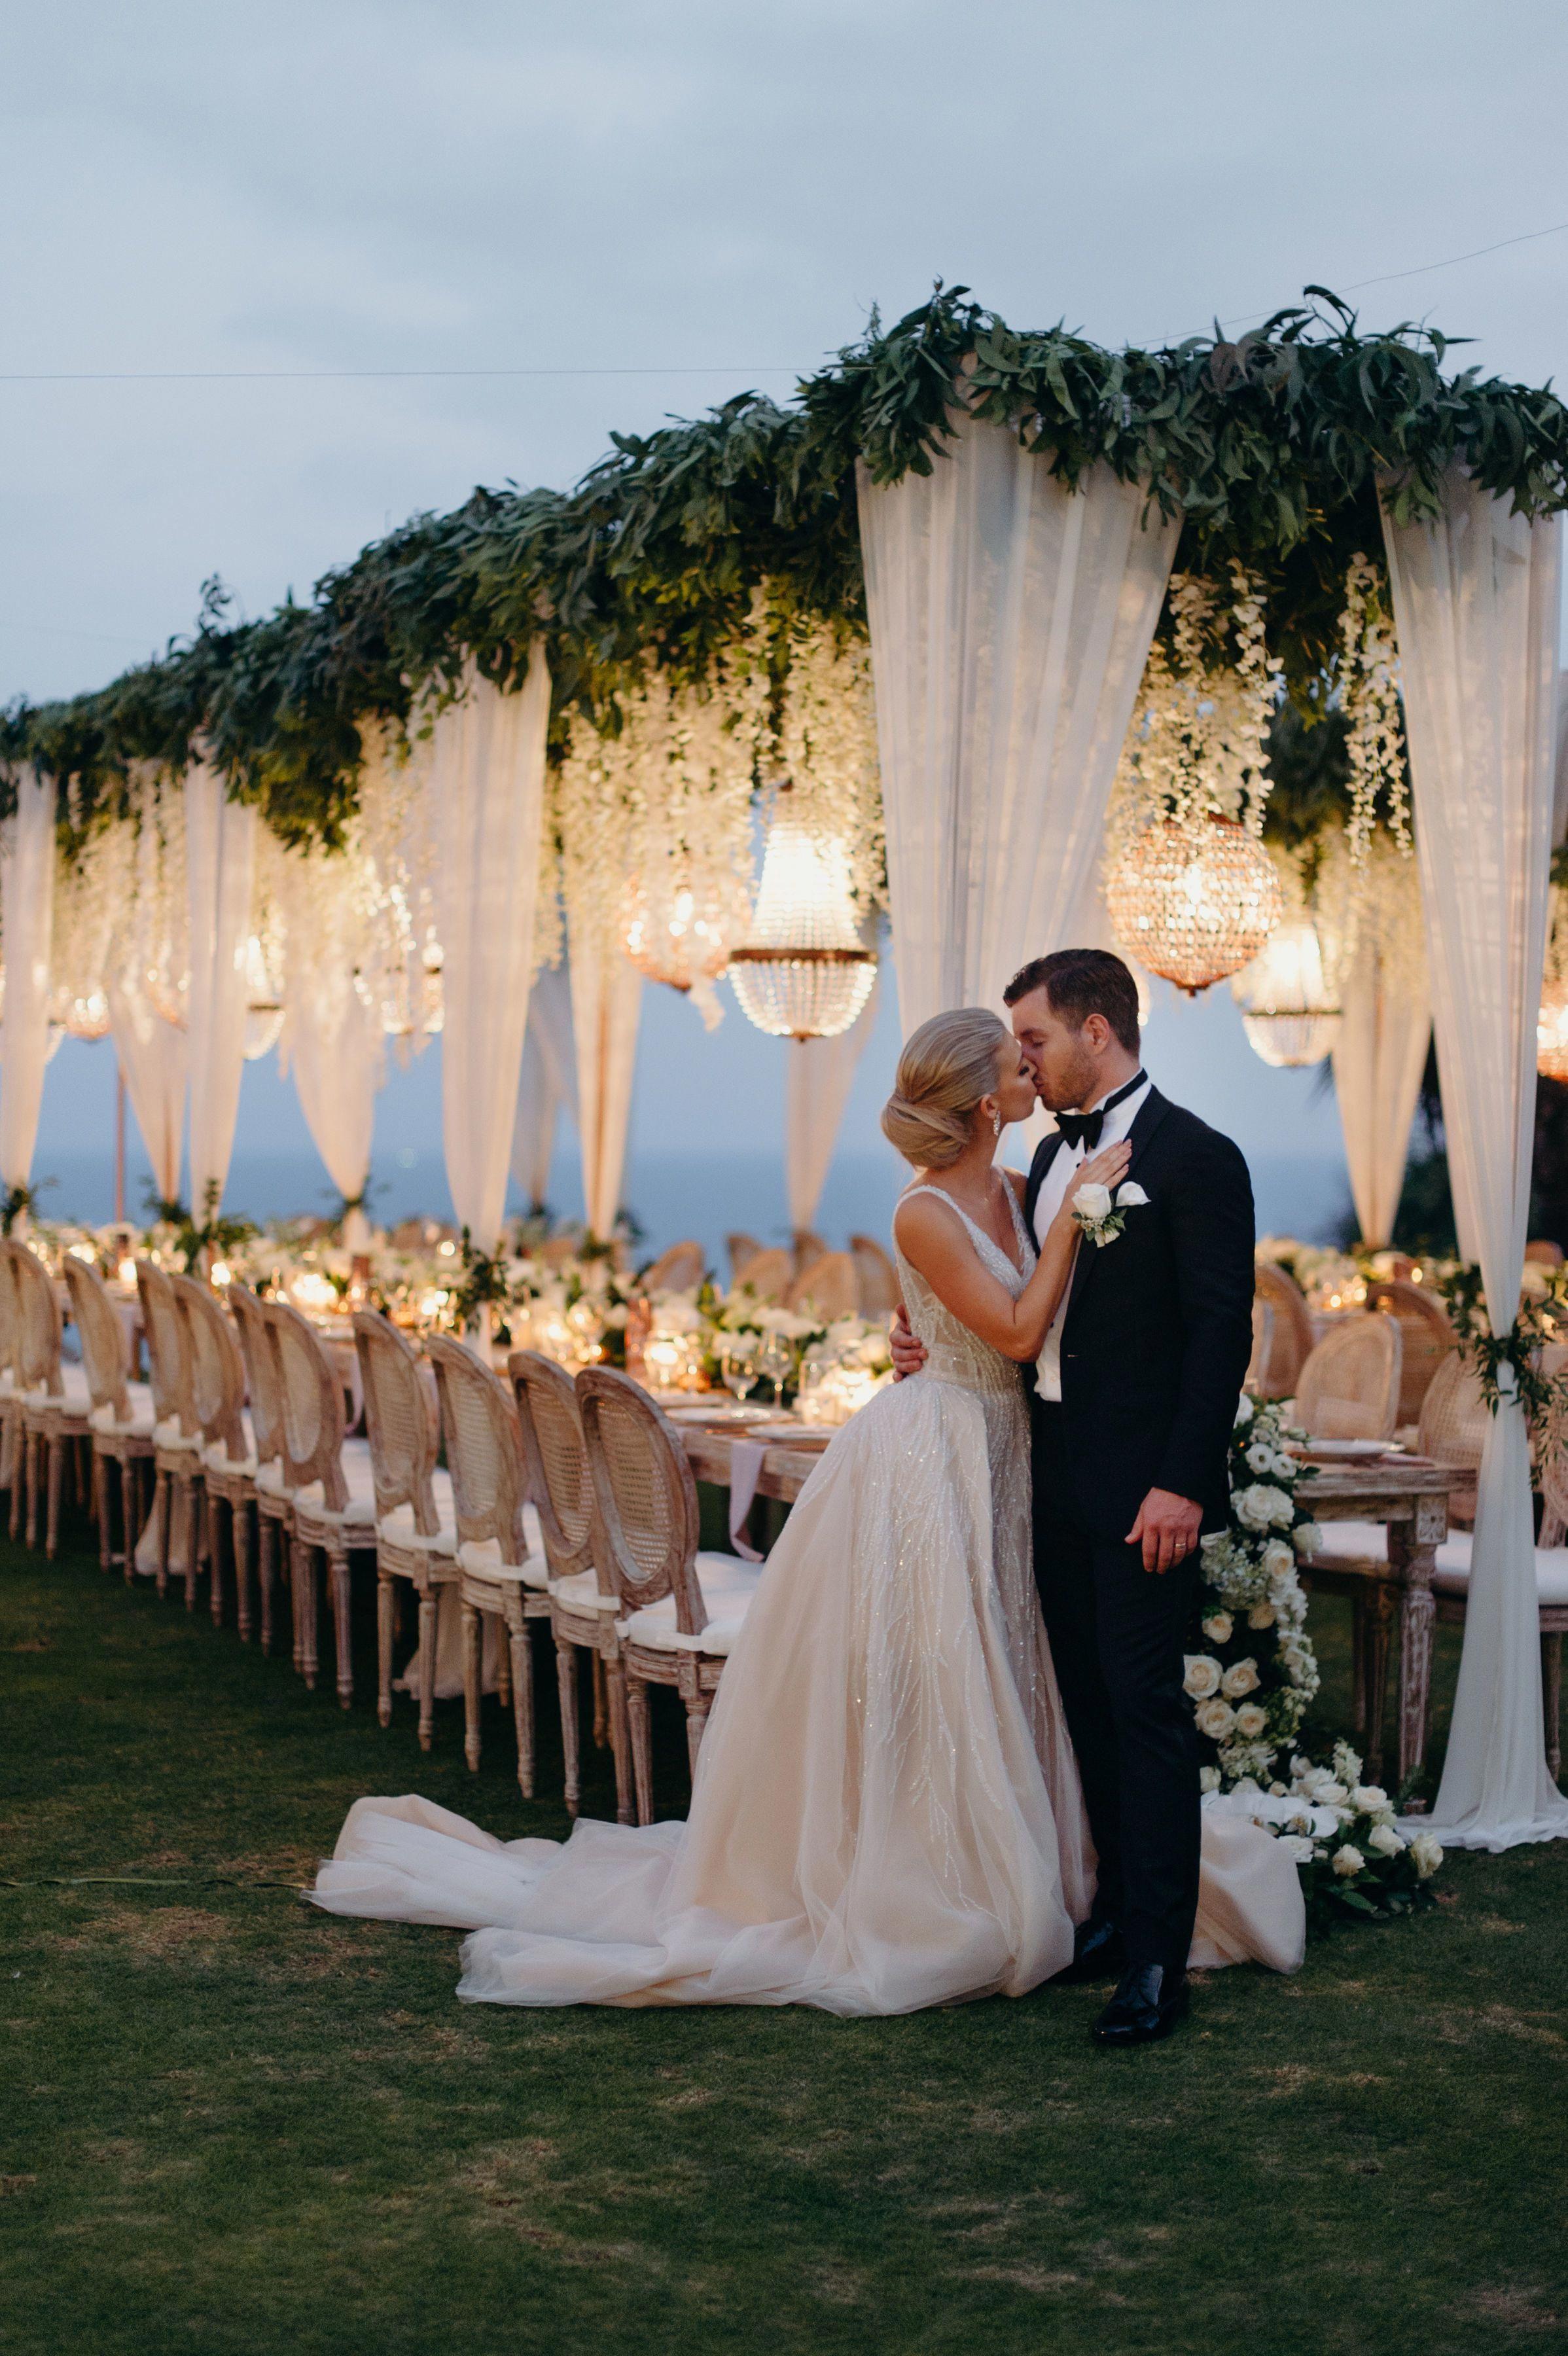 Affordable Wedding Venues In Nj Areweddingringspagan Weddingguide Wedding Dresses Bali Wedding